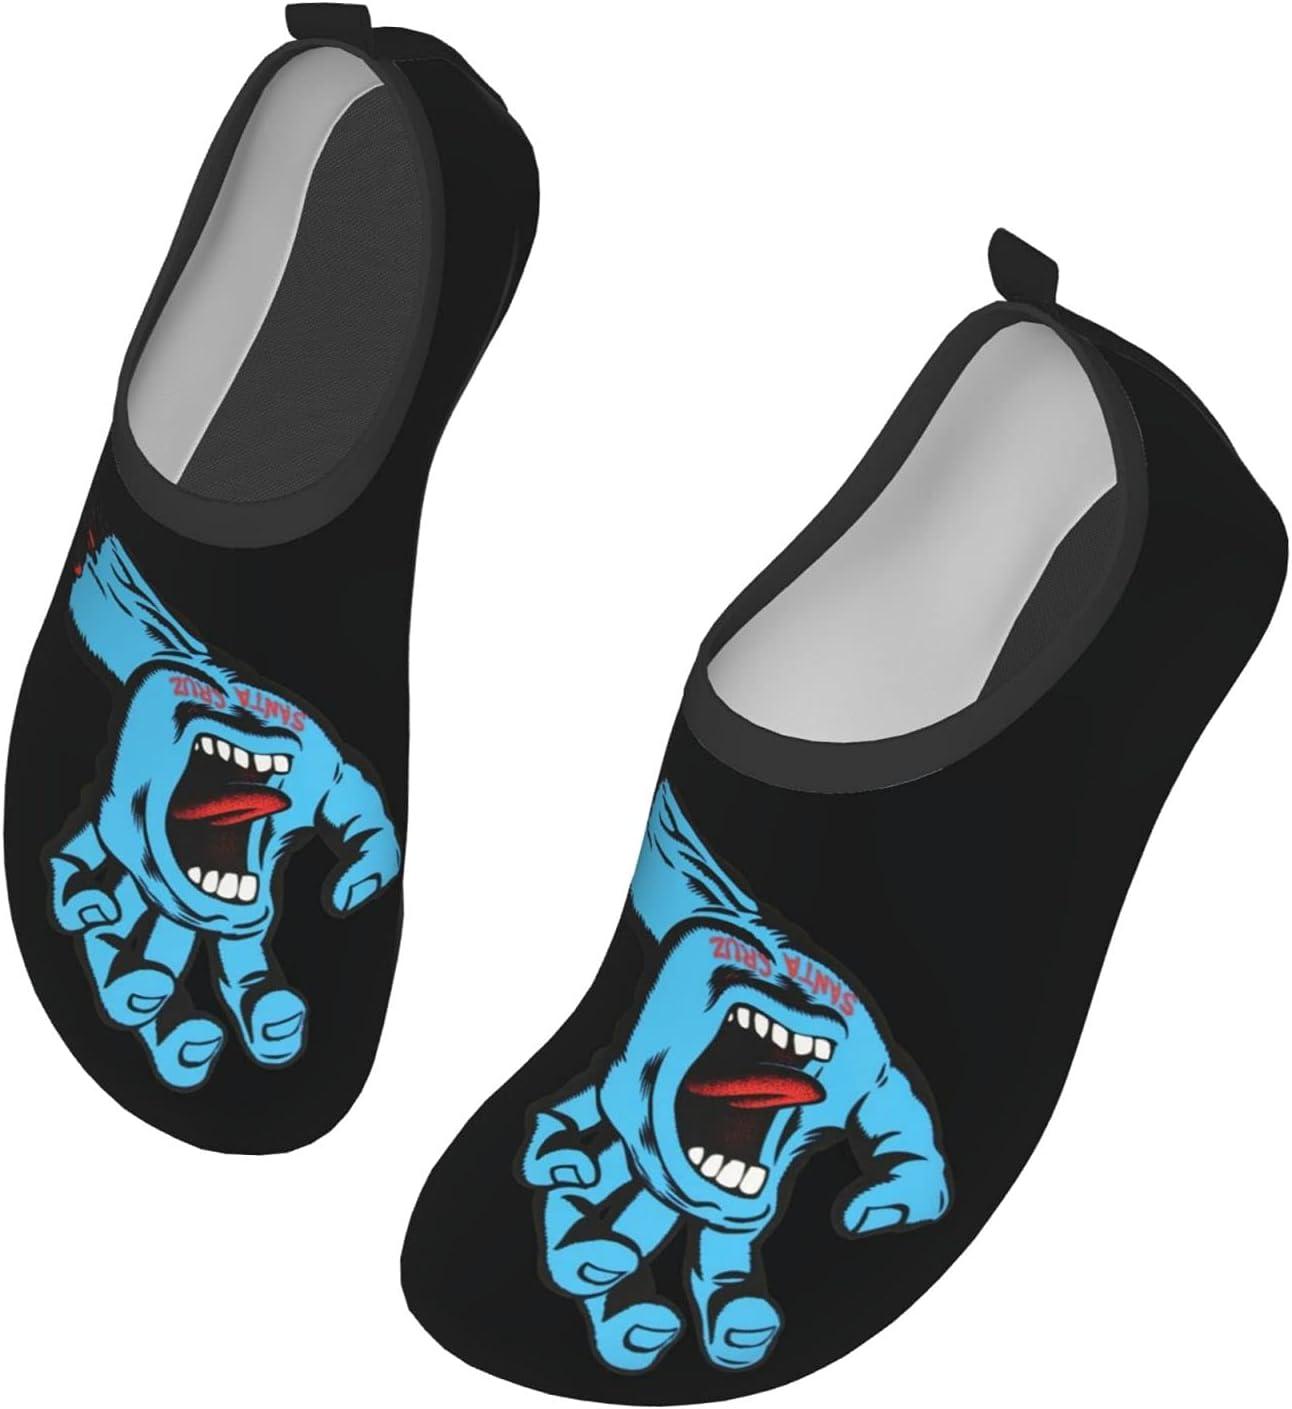 Lotogoto Sa-Nta C-Ruzmen'S and Women's Outdoor Sports Water Shoes, Beach, Swimming, Quick-Drying, Barefoot, Surfing, Yoga